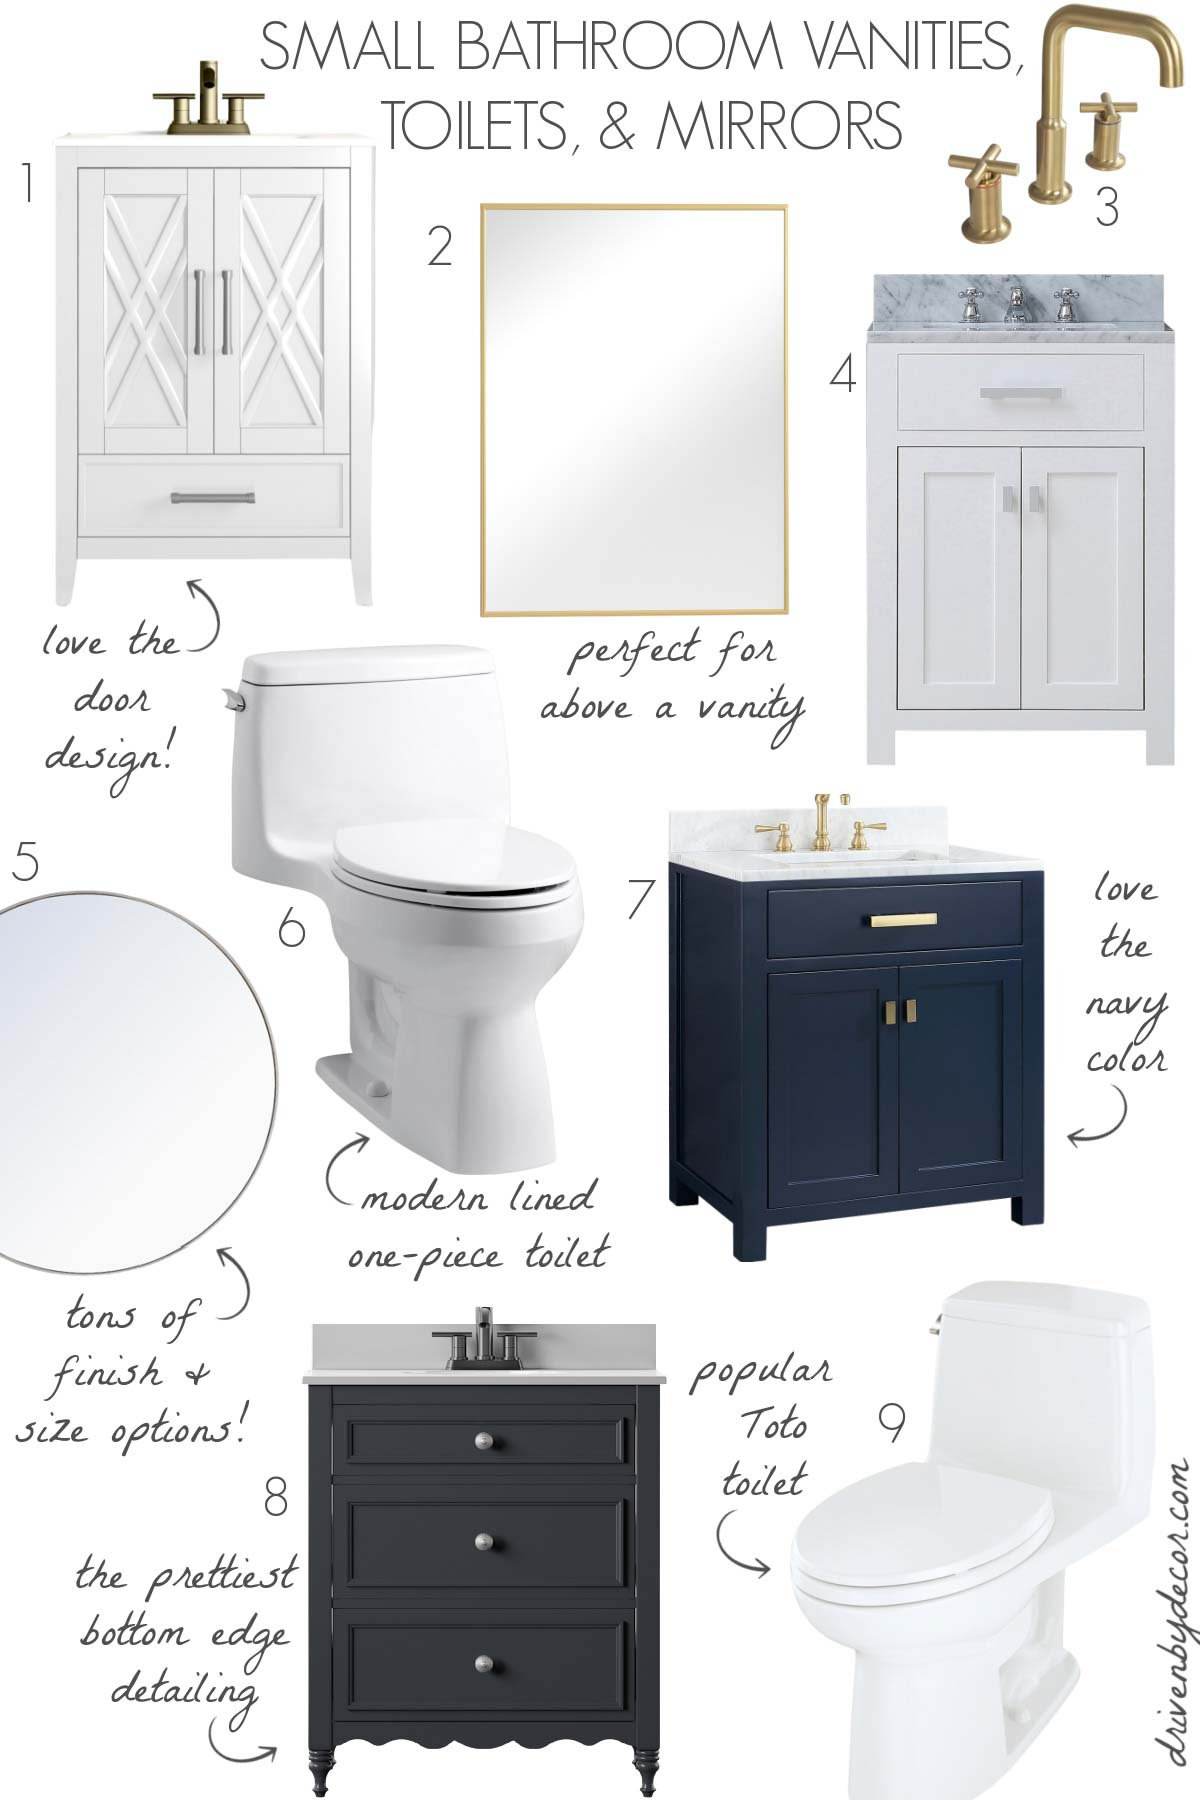 Vanities, mirrors, & toilets - the perfect bathroom upgrades!